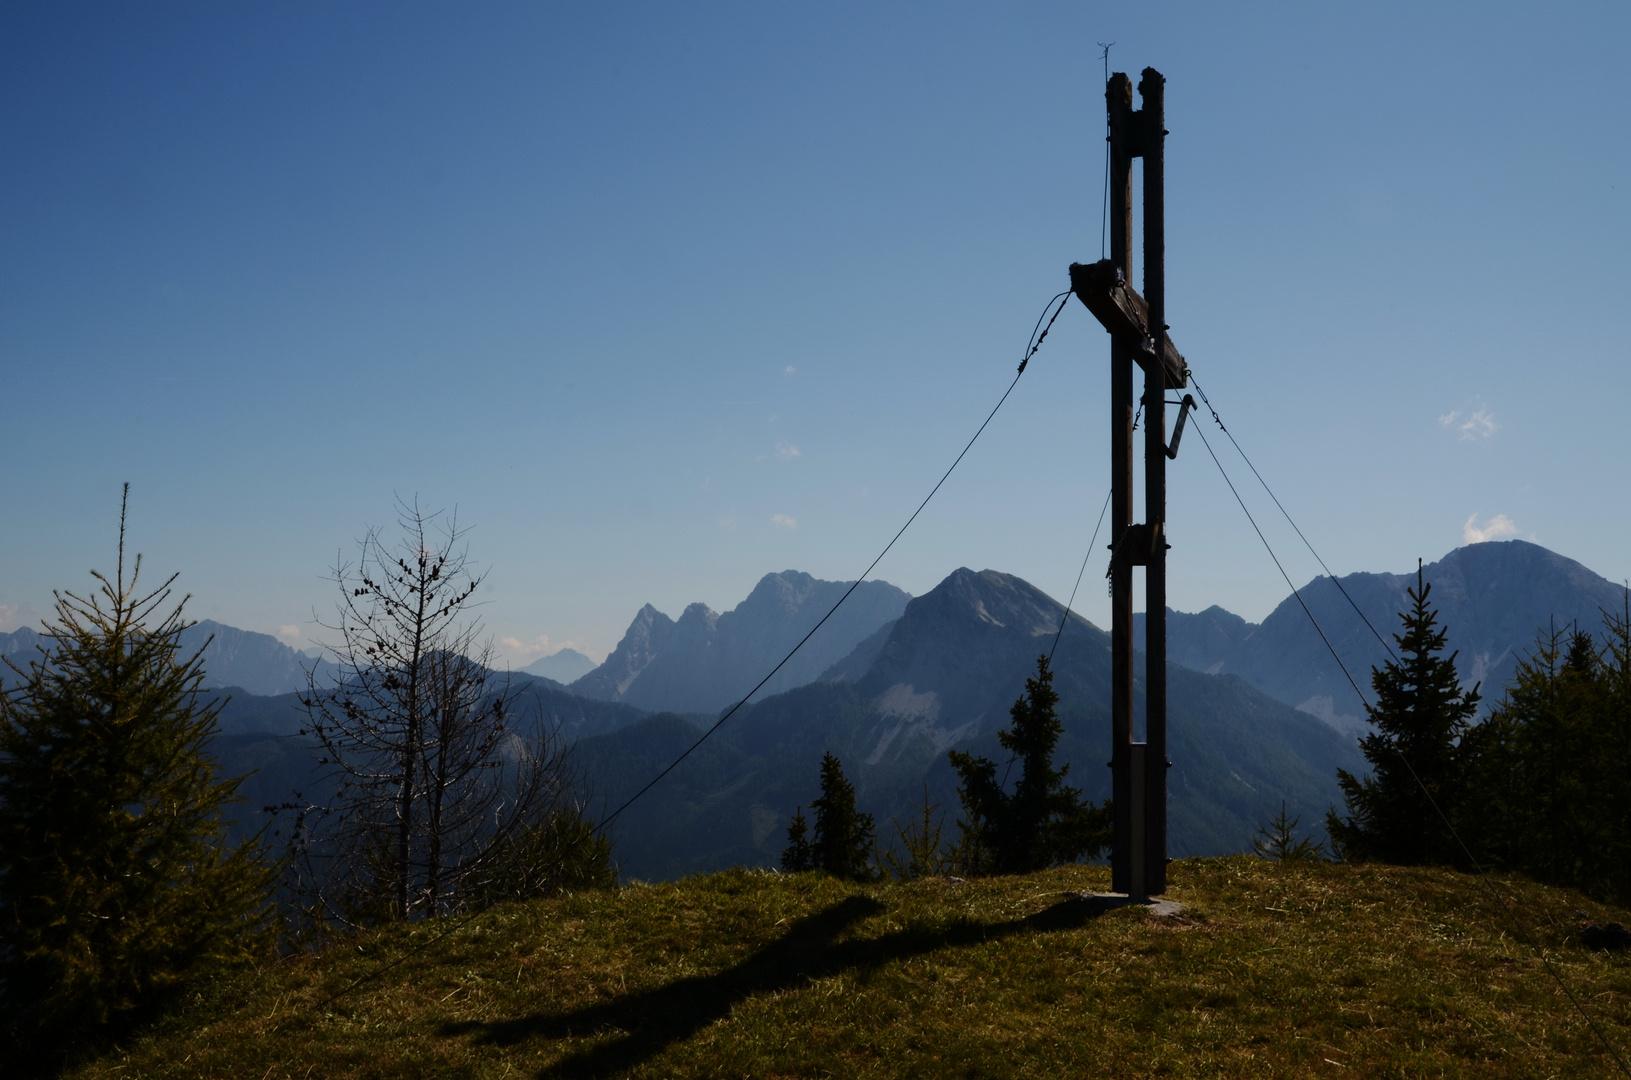 Der Matschachergupf über dem Rosental in Kärnten